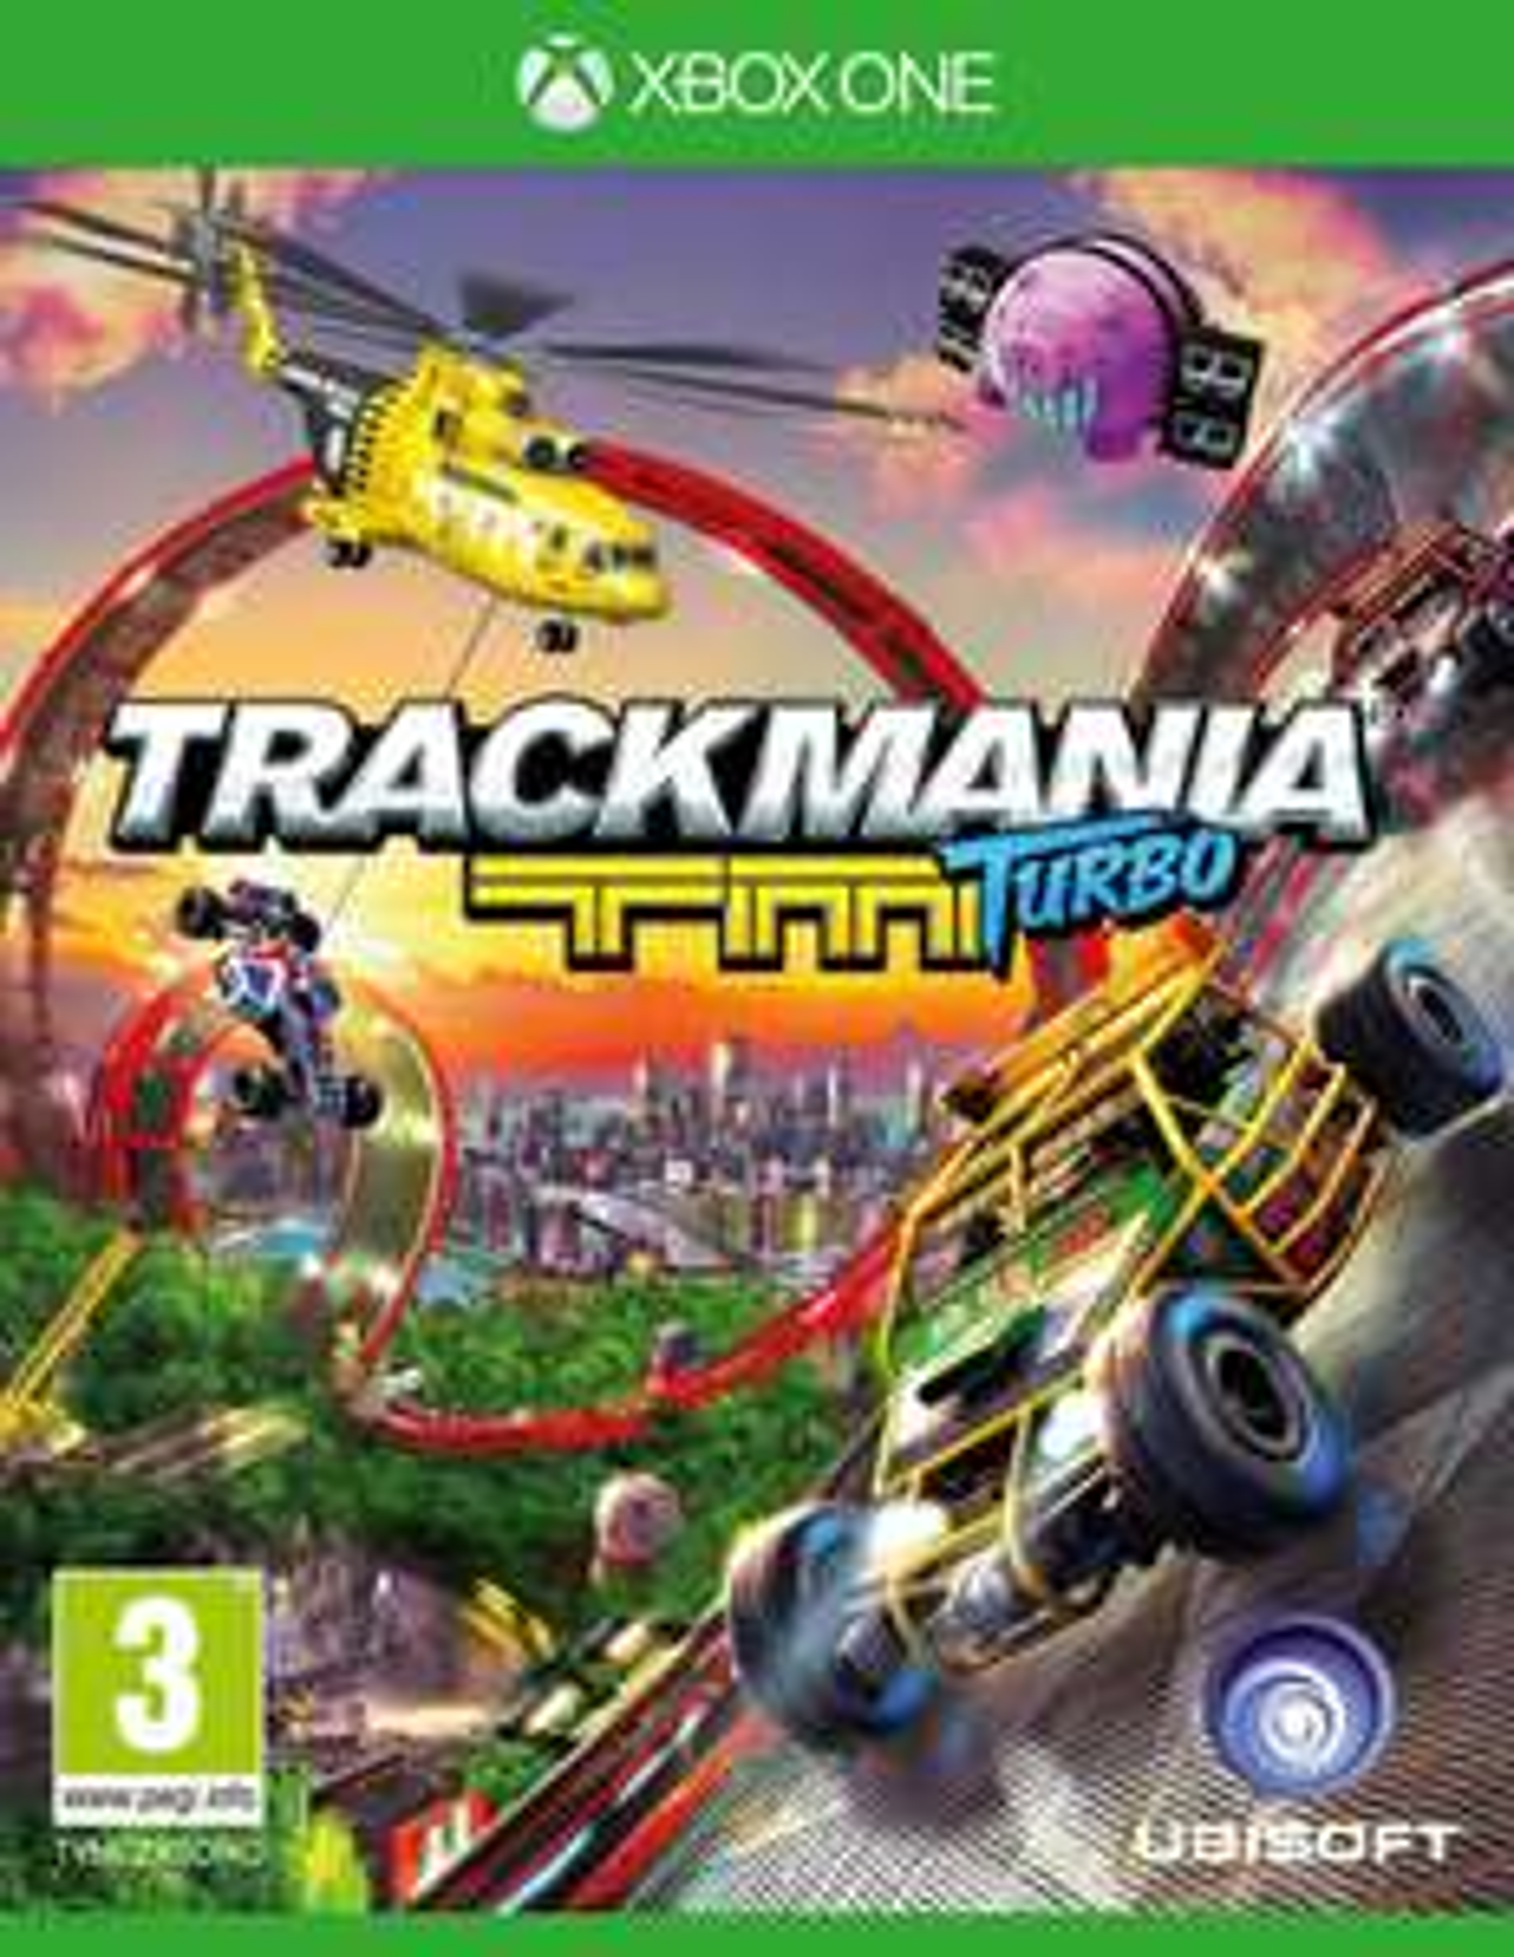 Trackmania Turbo (Xbox One) VPN